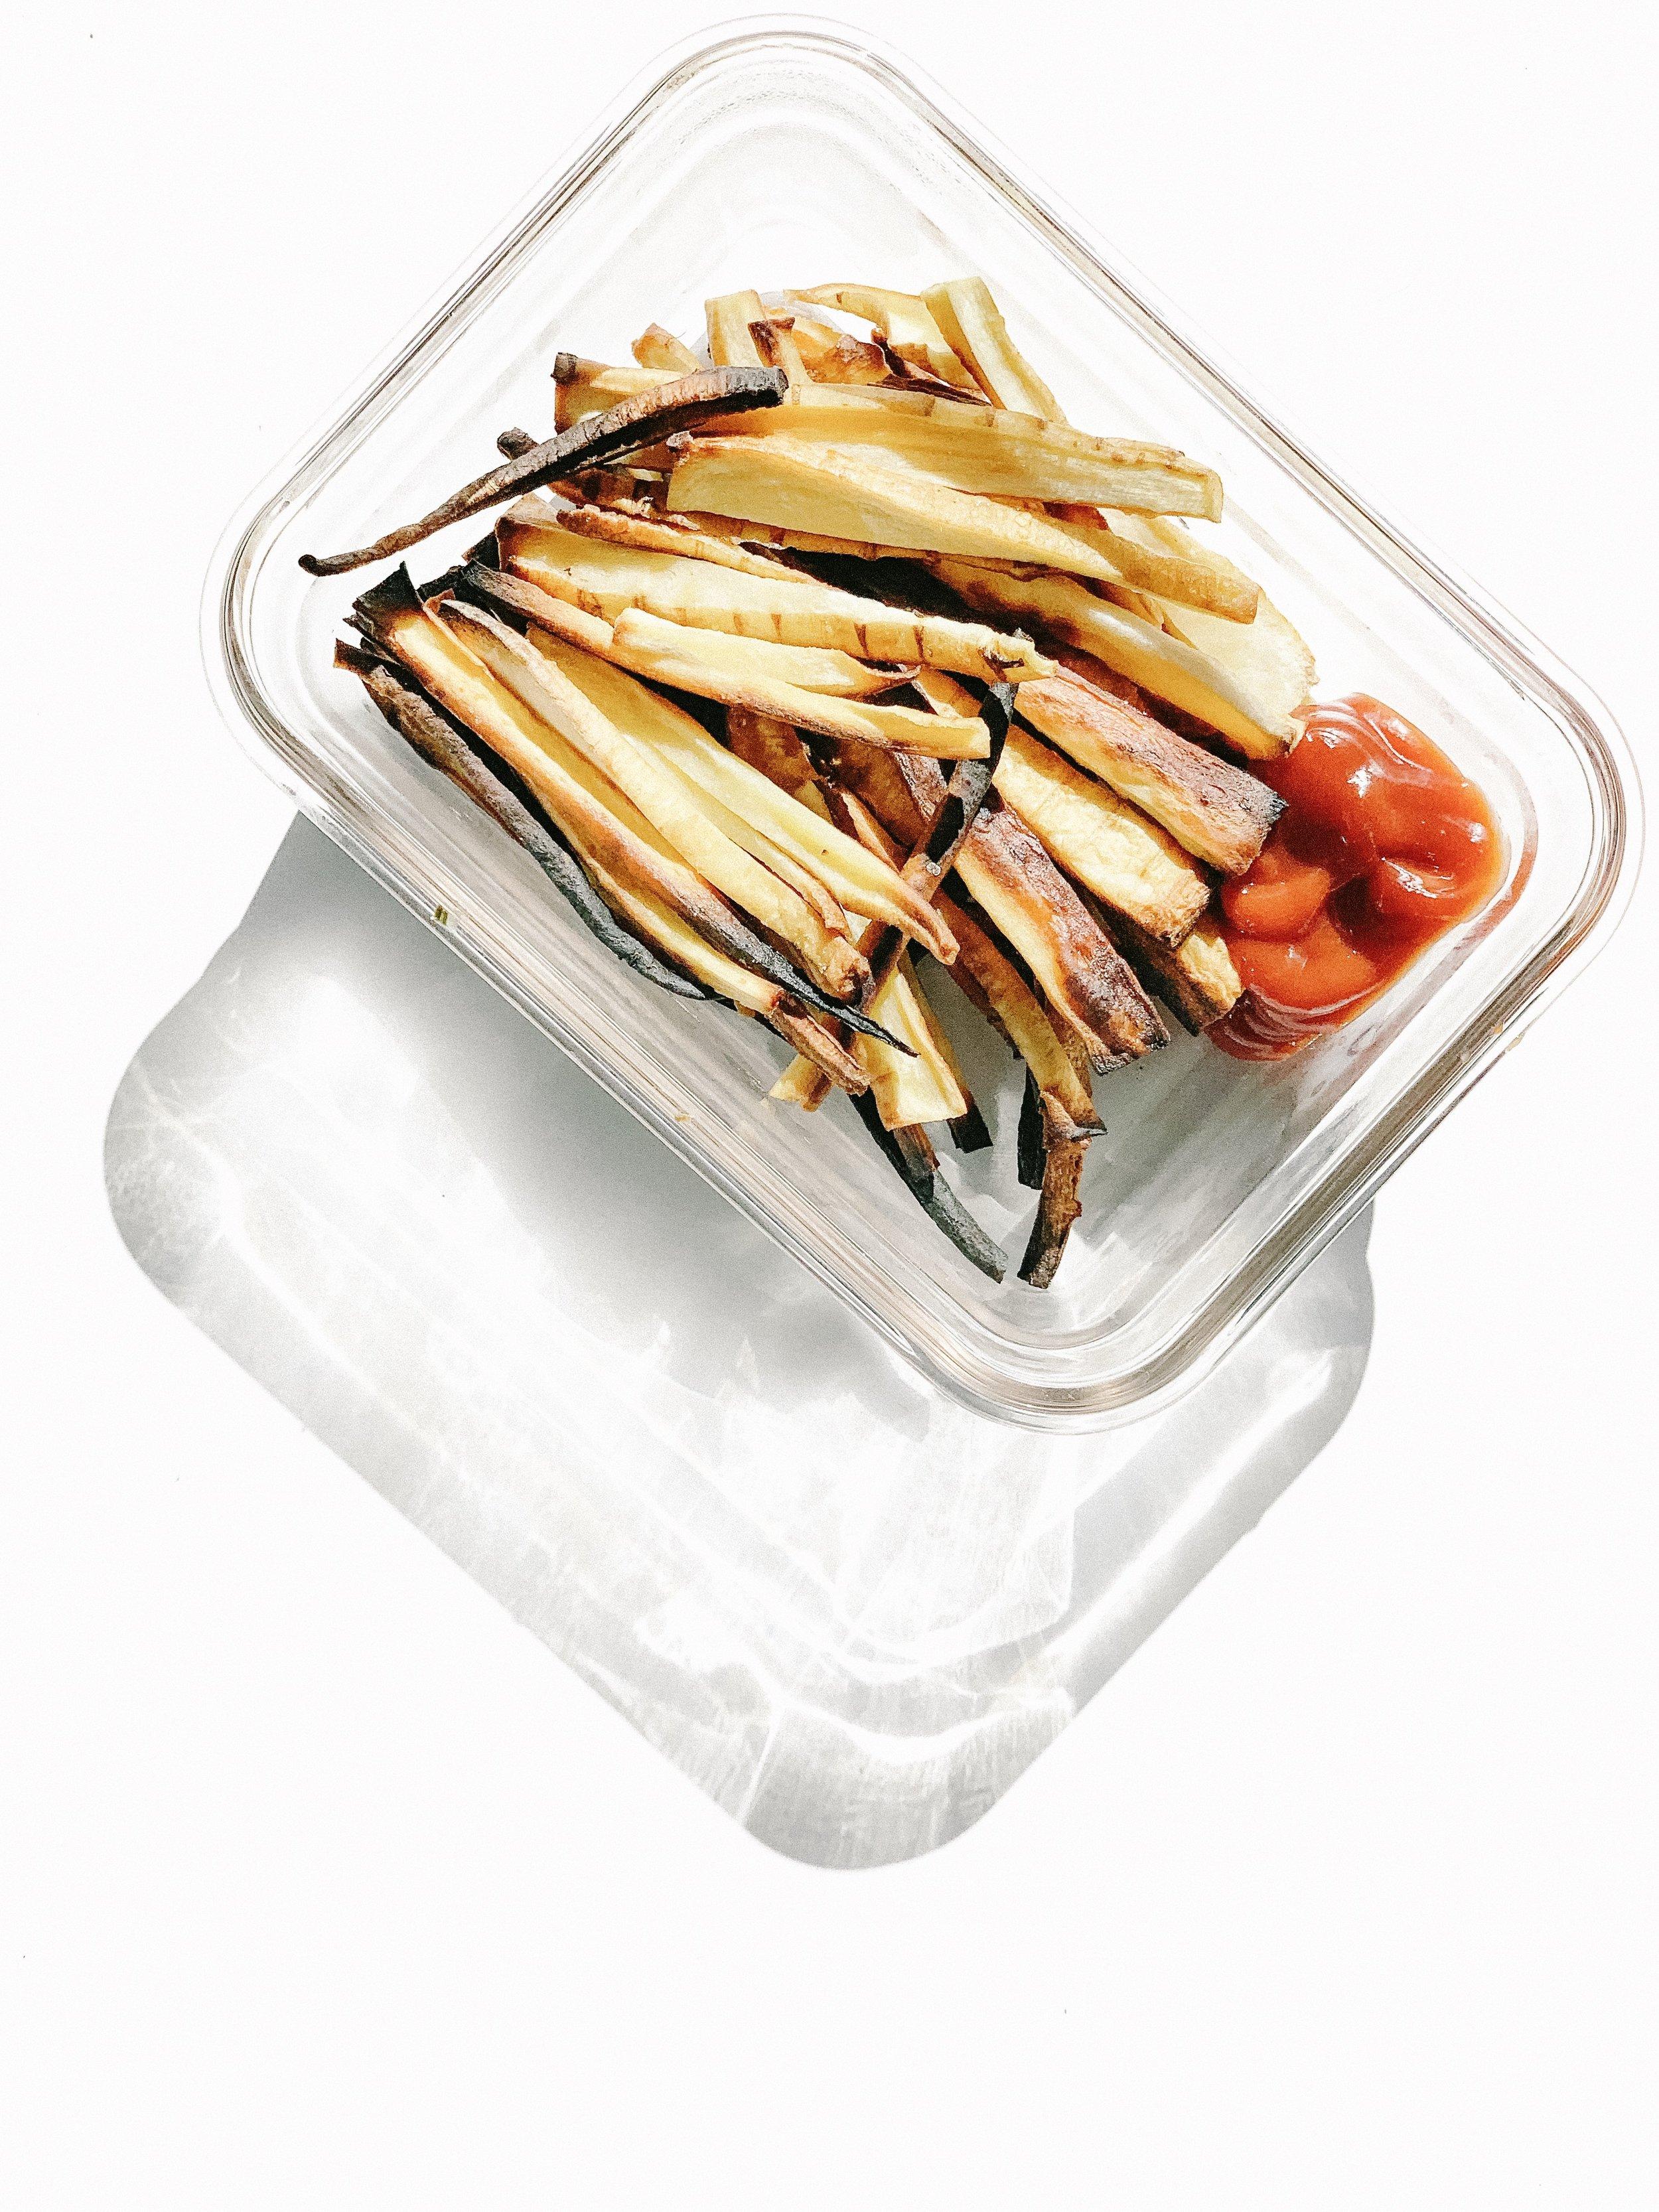 Paleo Parsnip Fries (AIP, Paleo, Gluten-Free, Dairy-Free)